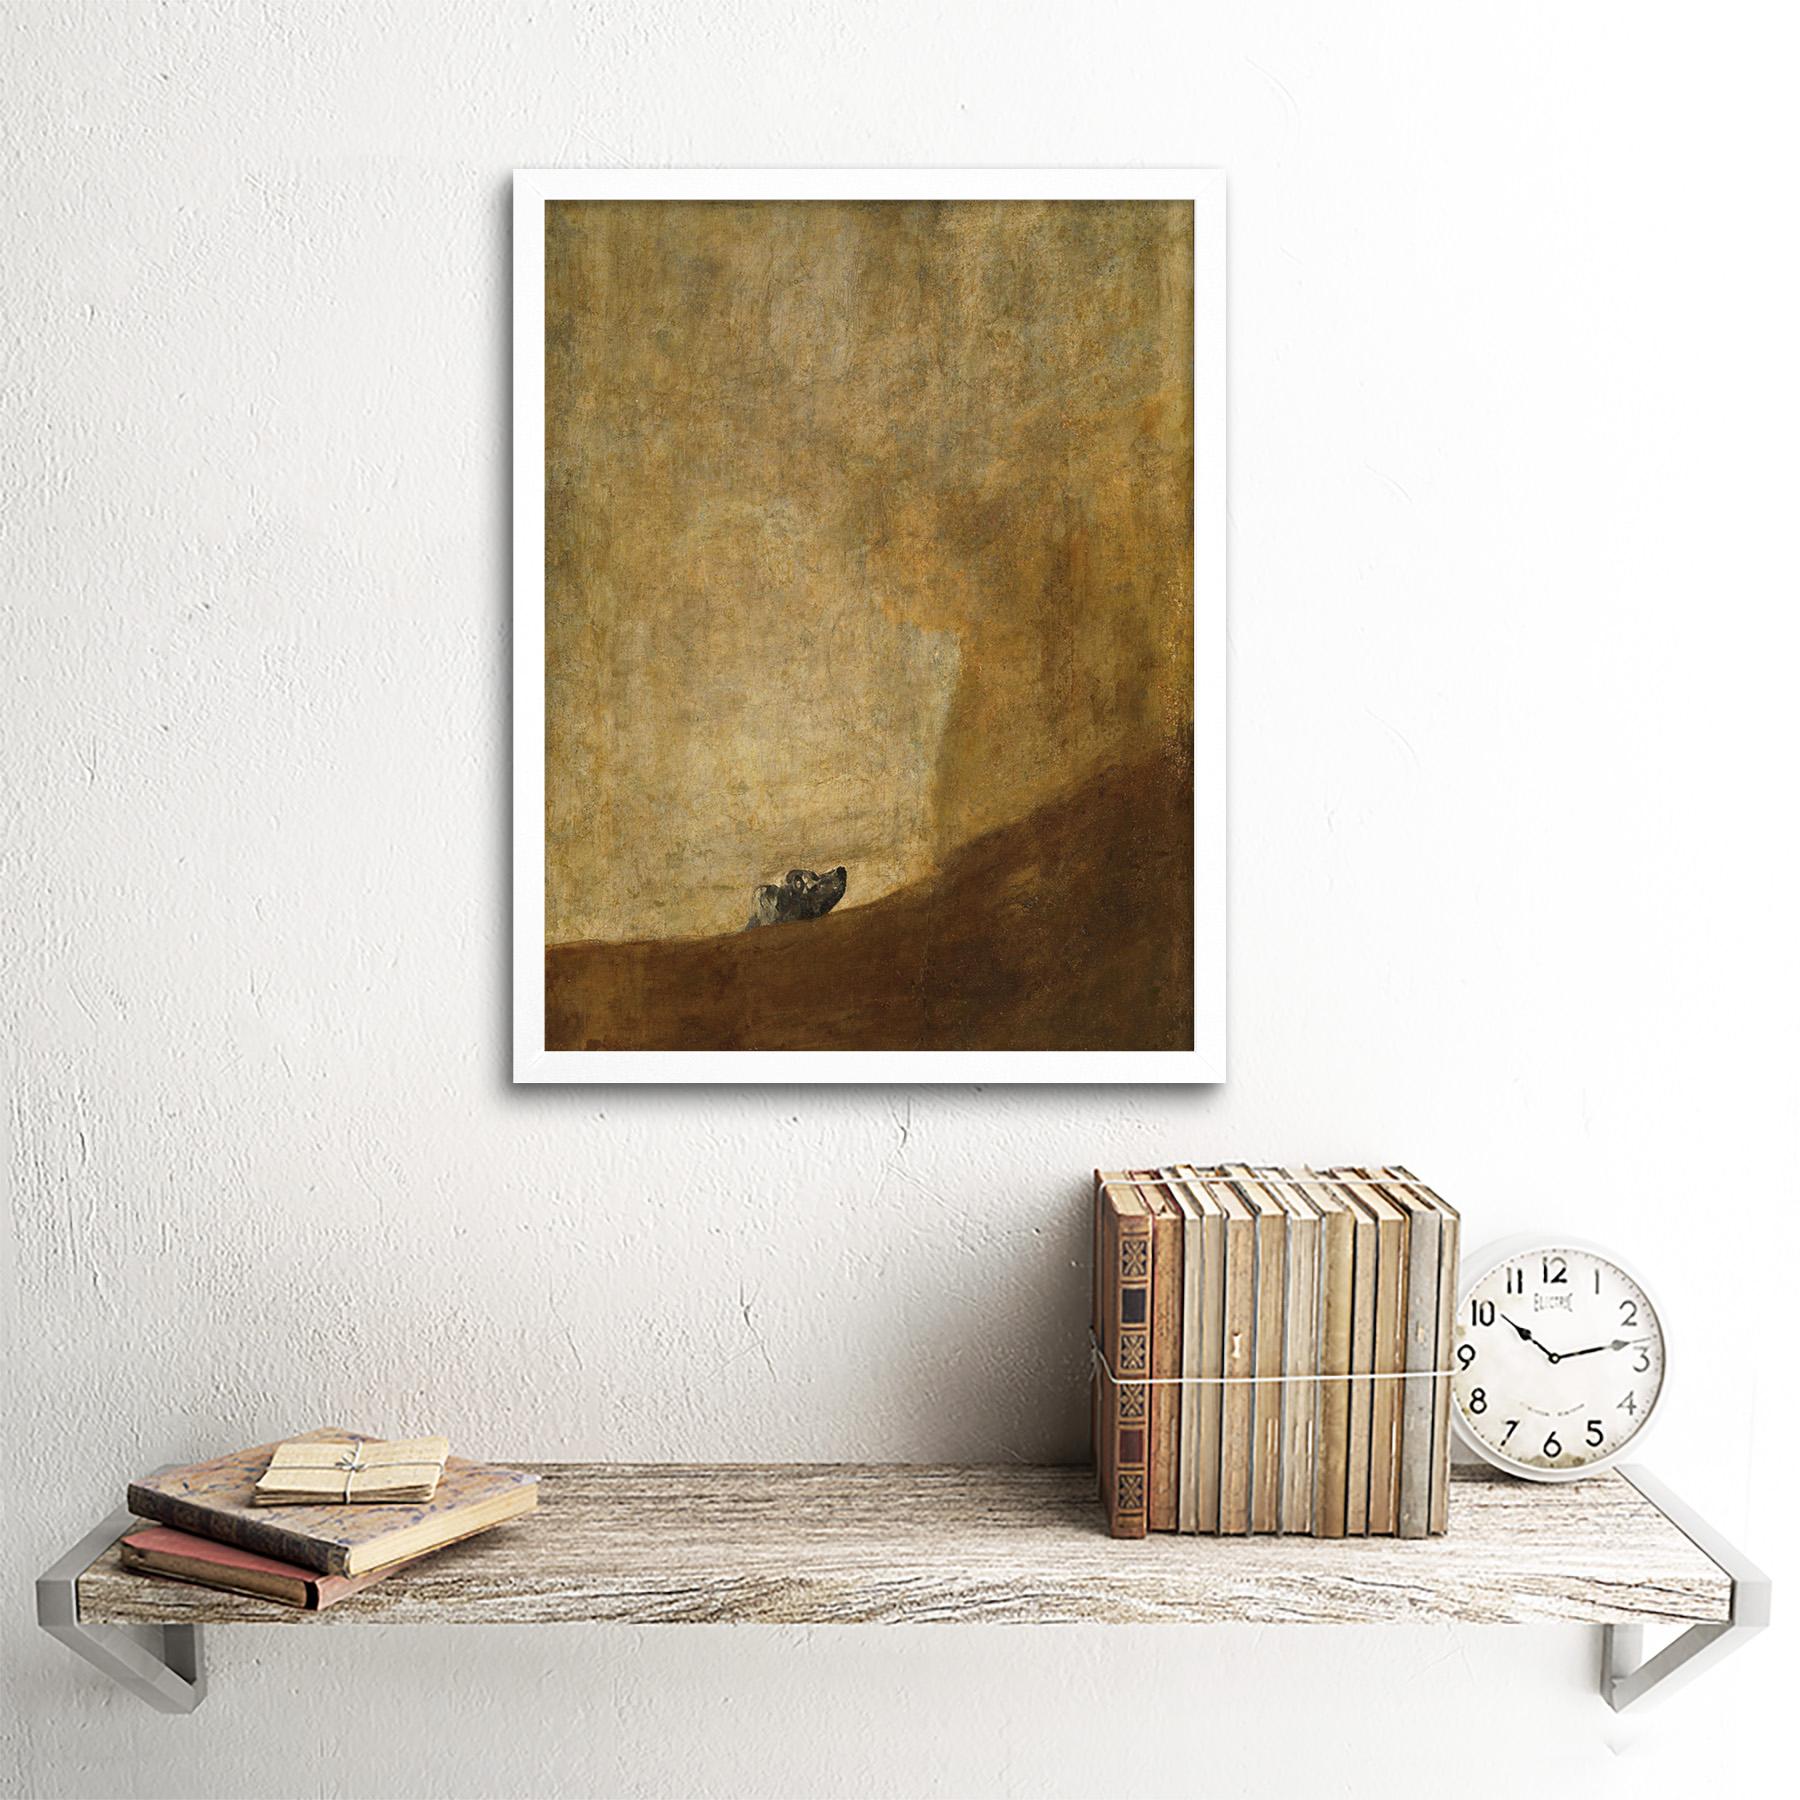 Goya-Dog-Painting-Wall-Art-Print-Framed-12x16 thumbnail 18